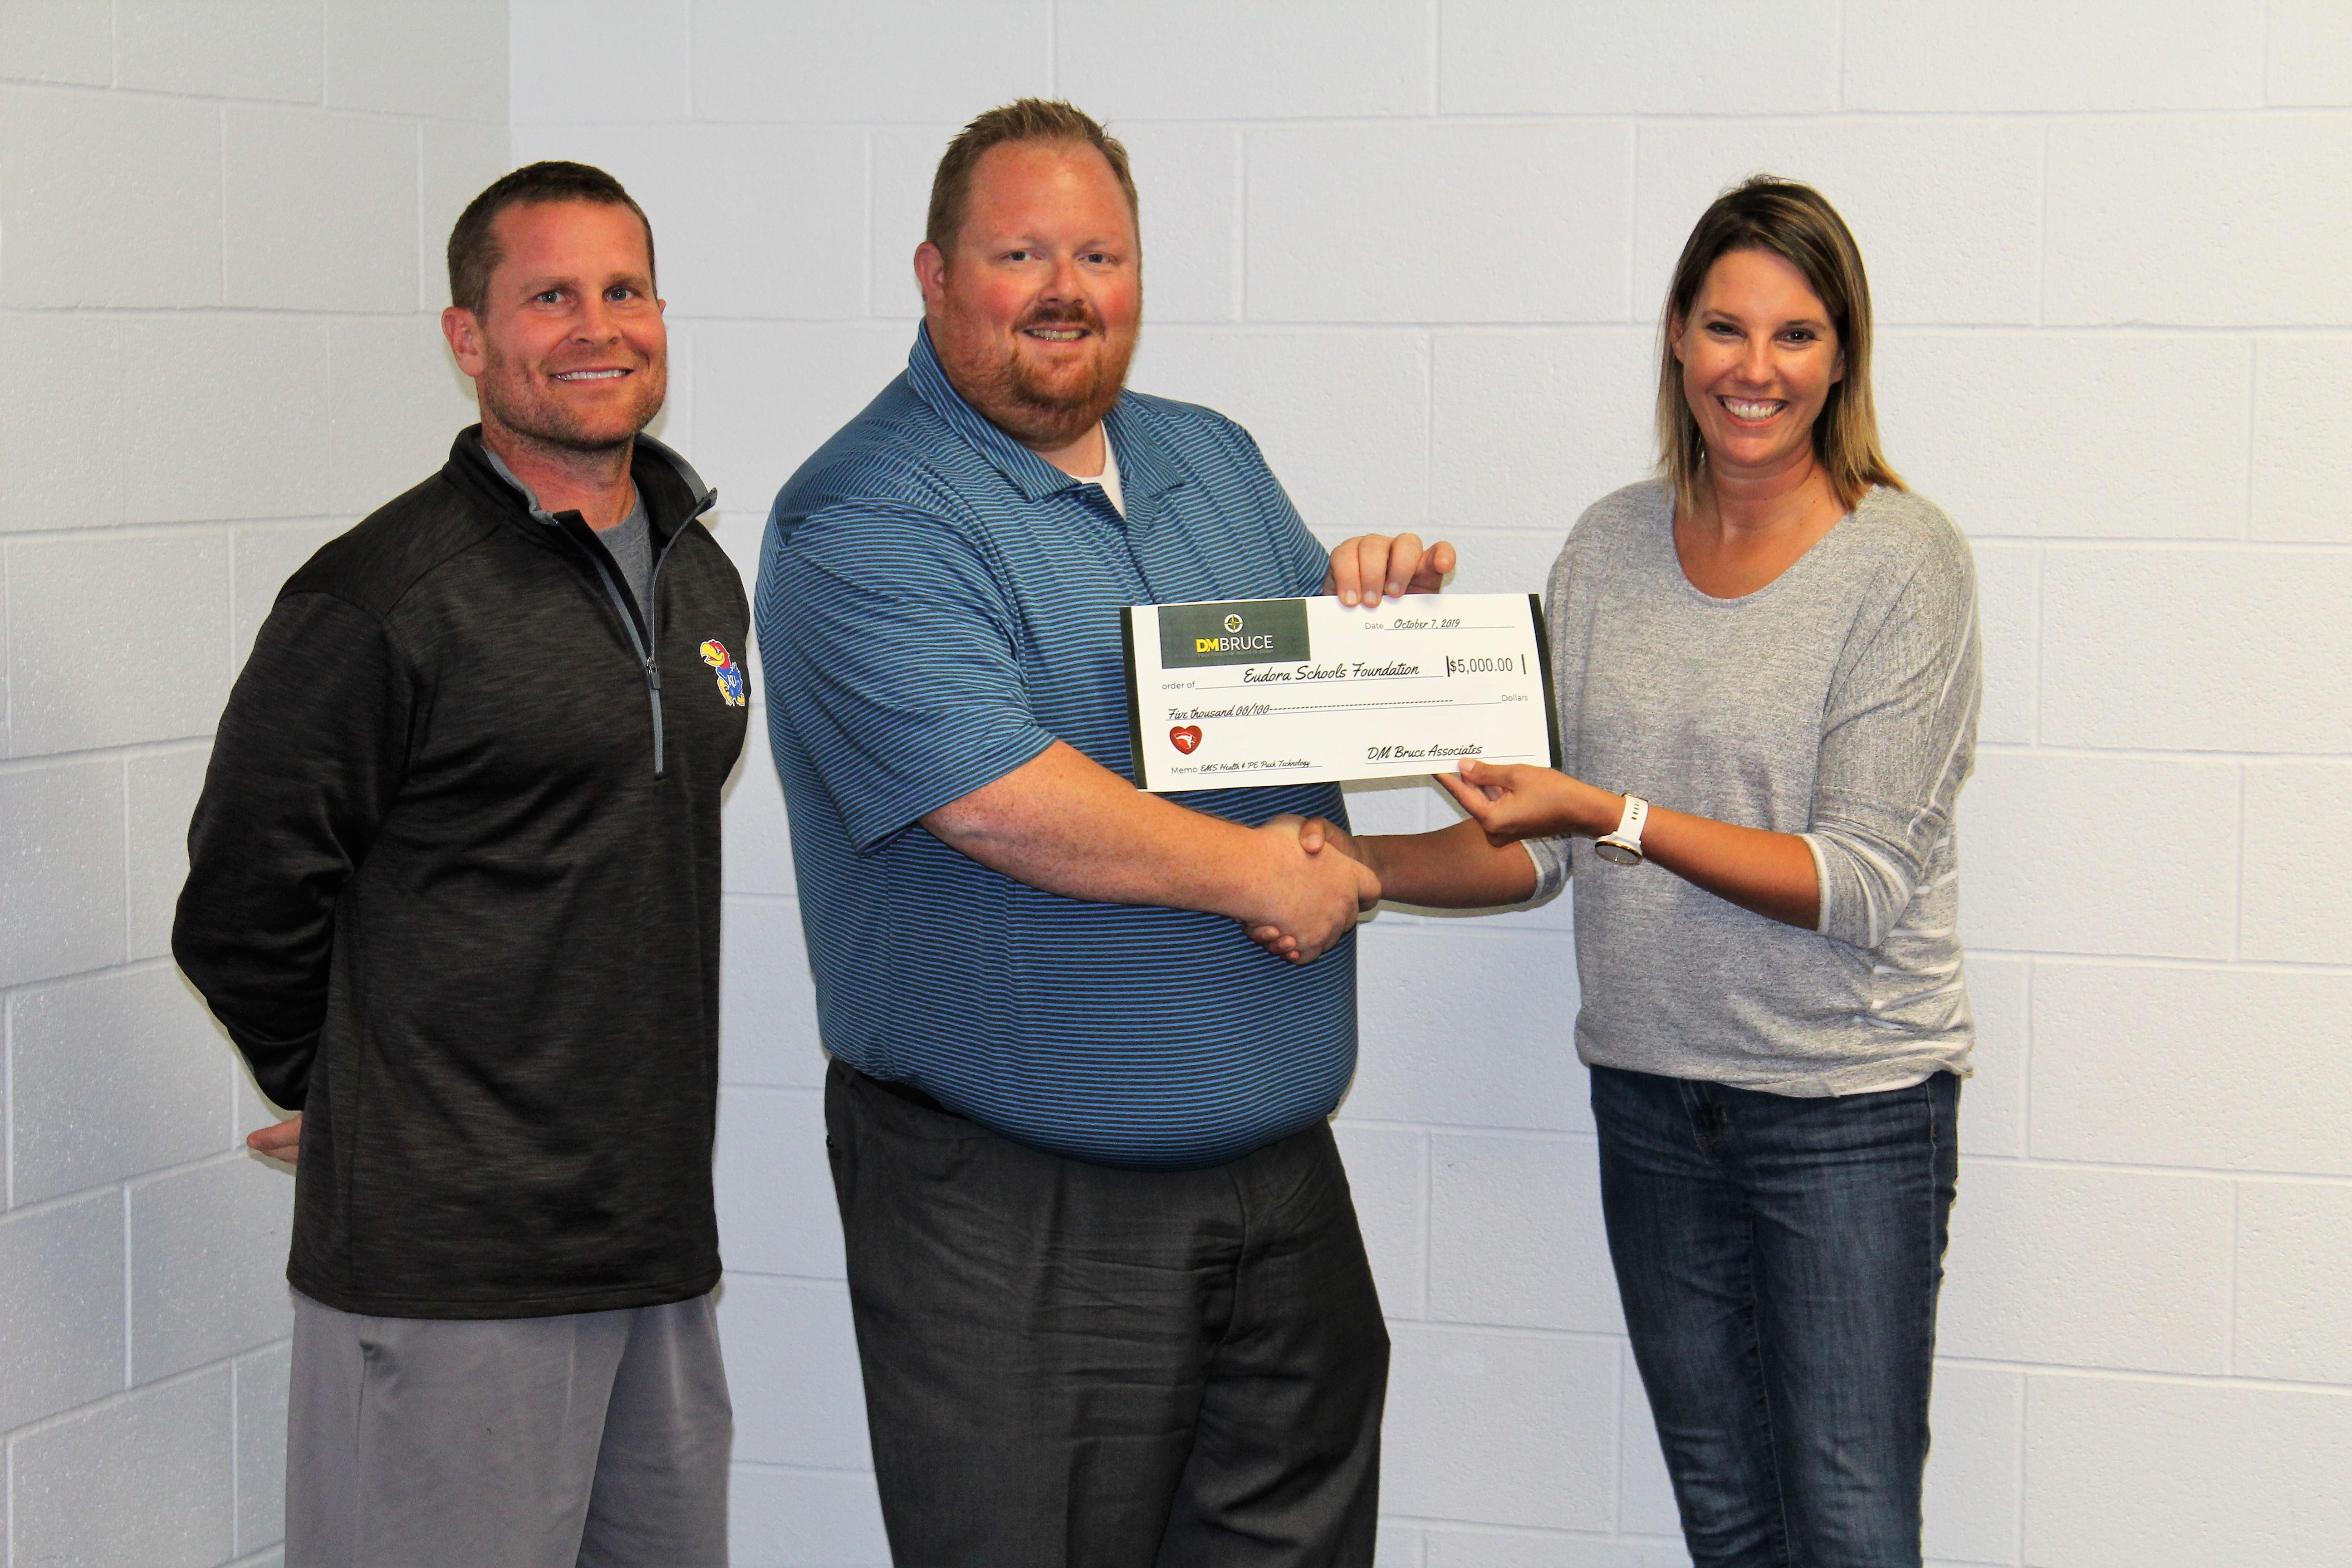 DM Bruce Associates Makes $5000 Donation to Eudora Schools Foundation for Velocity Training Technology at Eudora Middle School